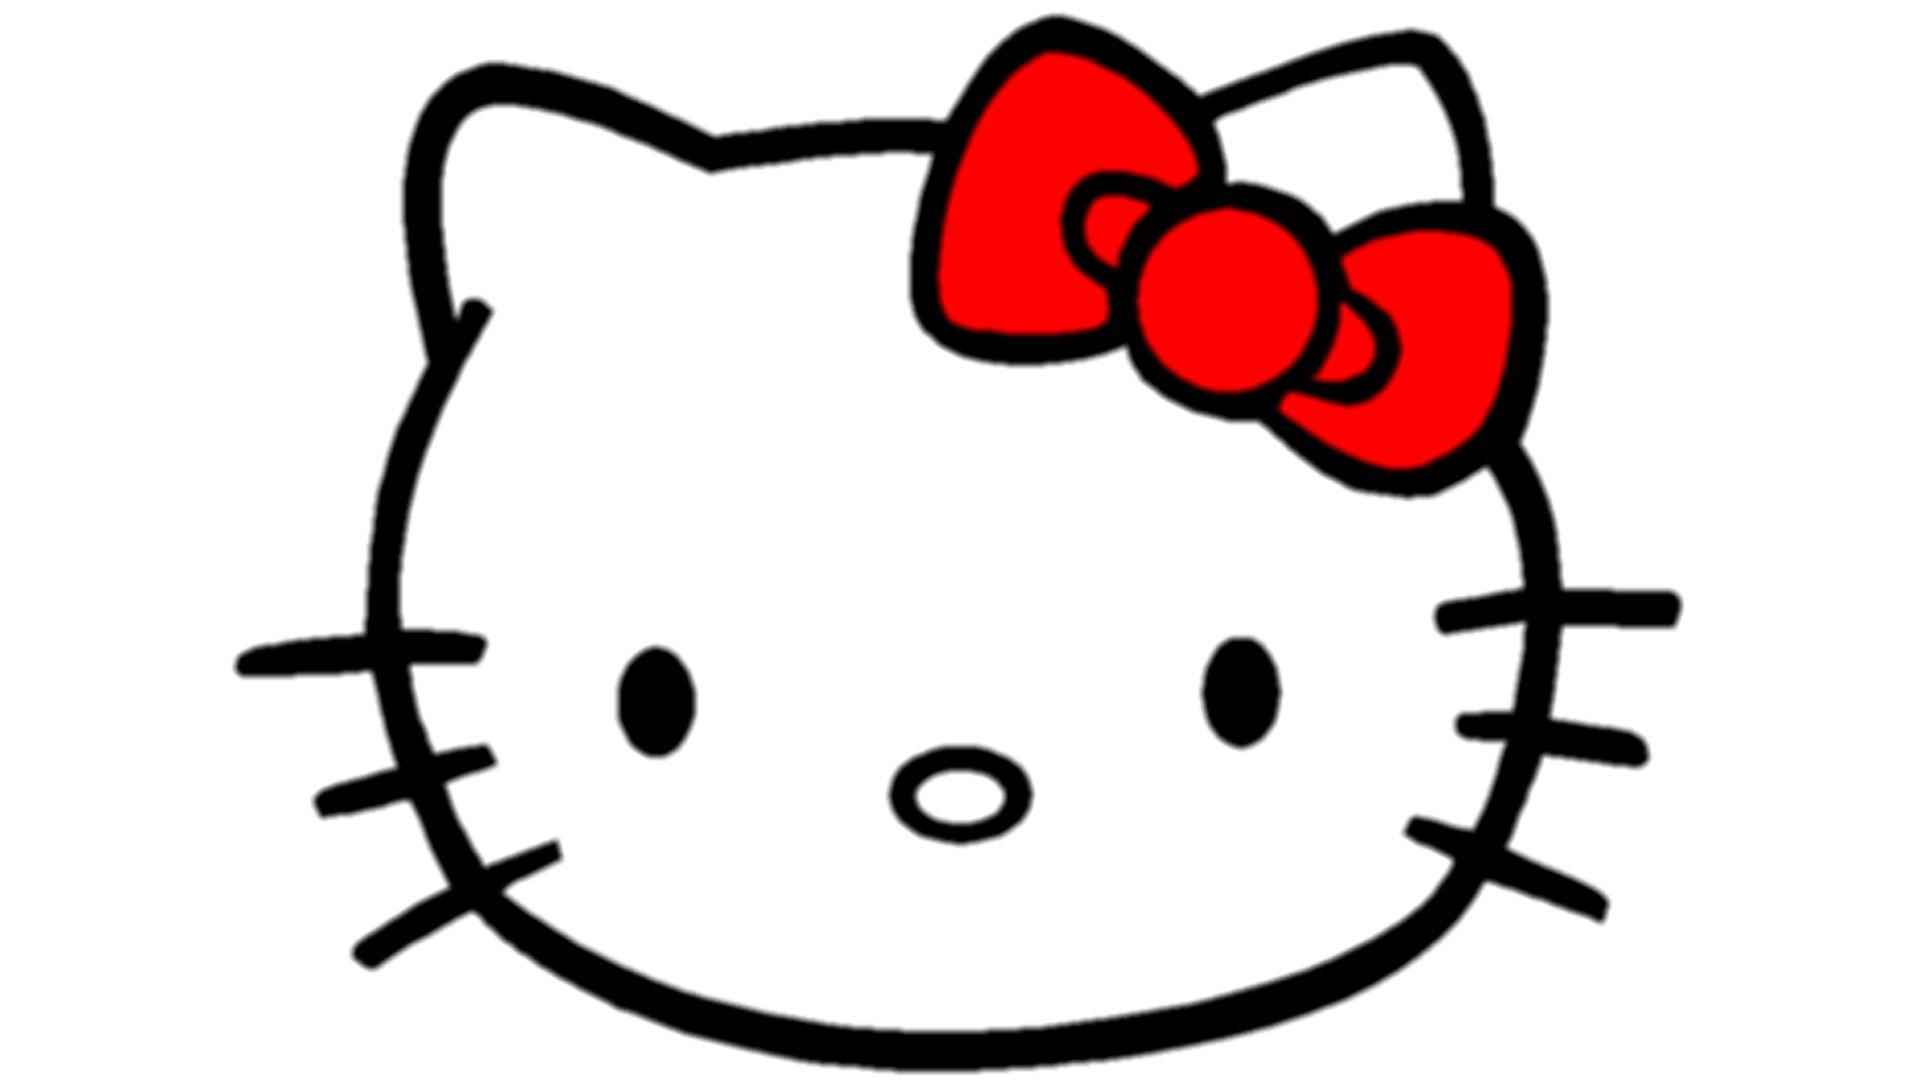 51908e5b78f0c28528.jpg (1920×1080) | Hello kitty tattoos, Hello ...